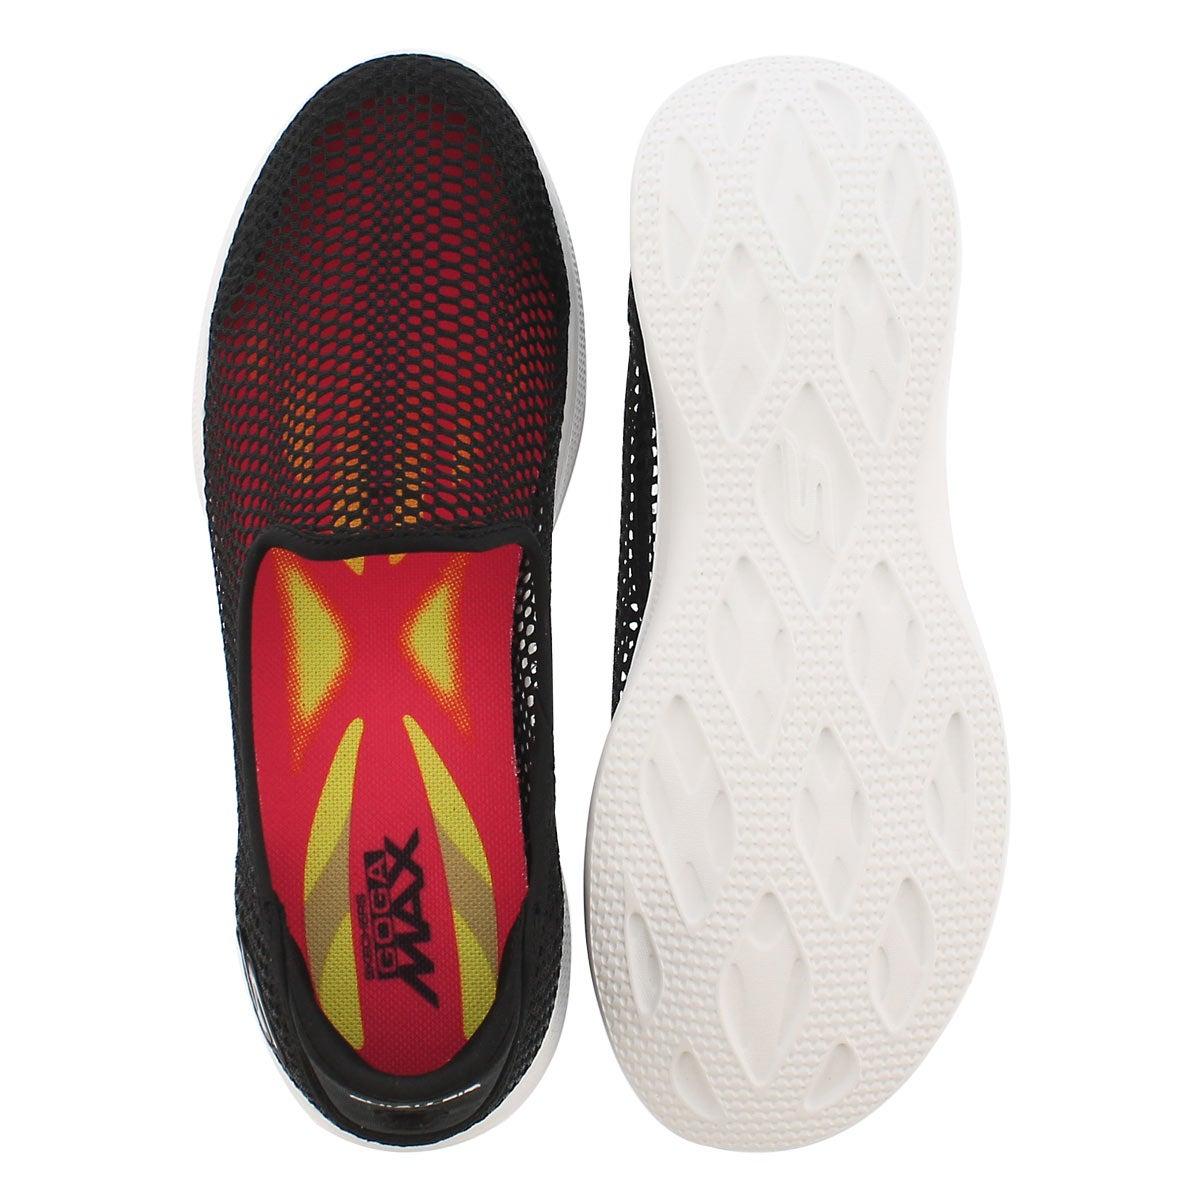 Lds GO Step Lite Wispy blk walking shoe